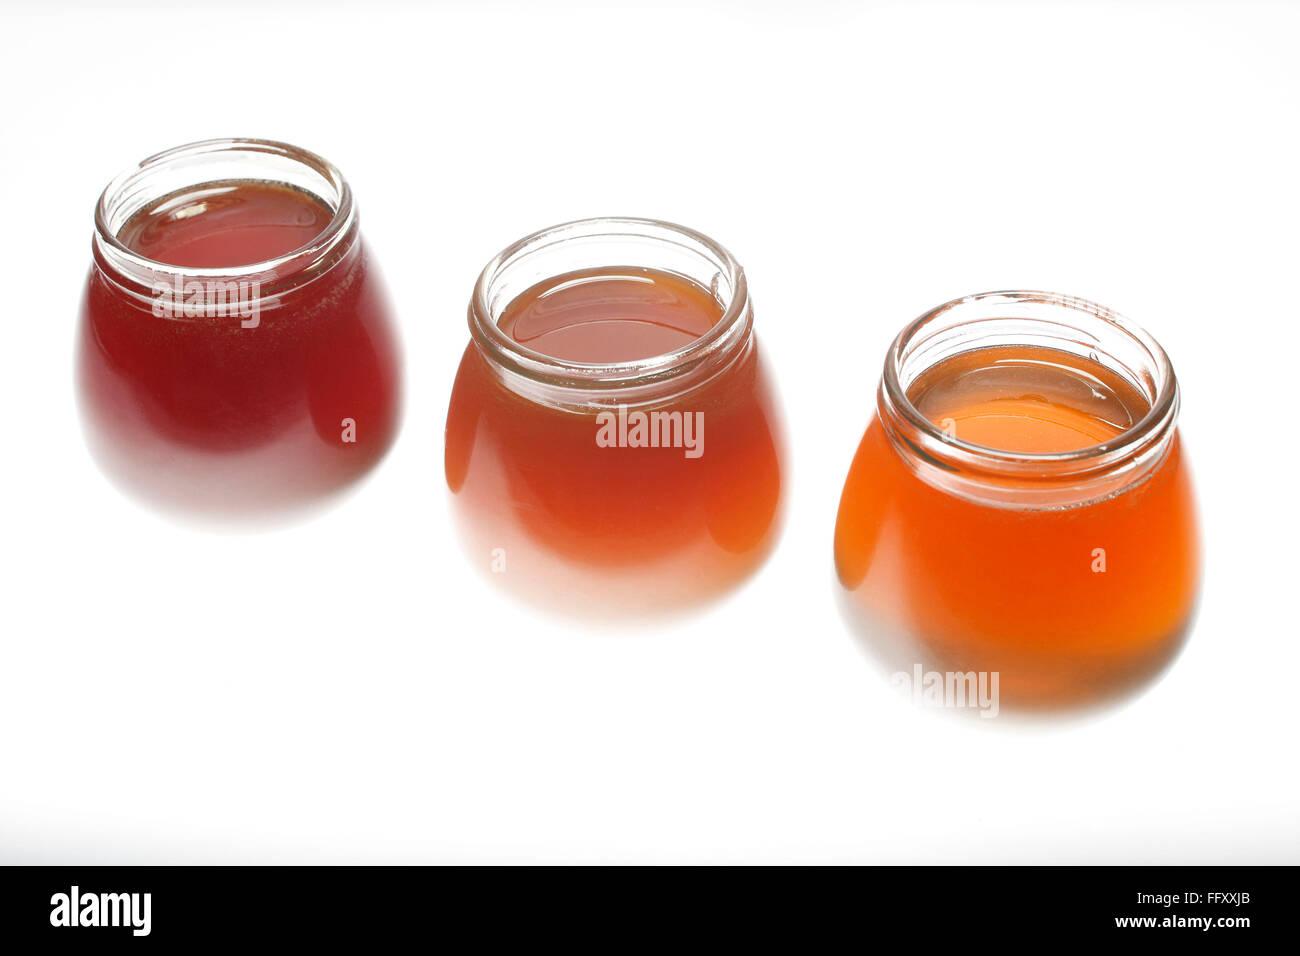 Food , honey of three flavour orange blossom till & bajra in bottles - Stock Image